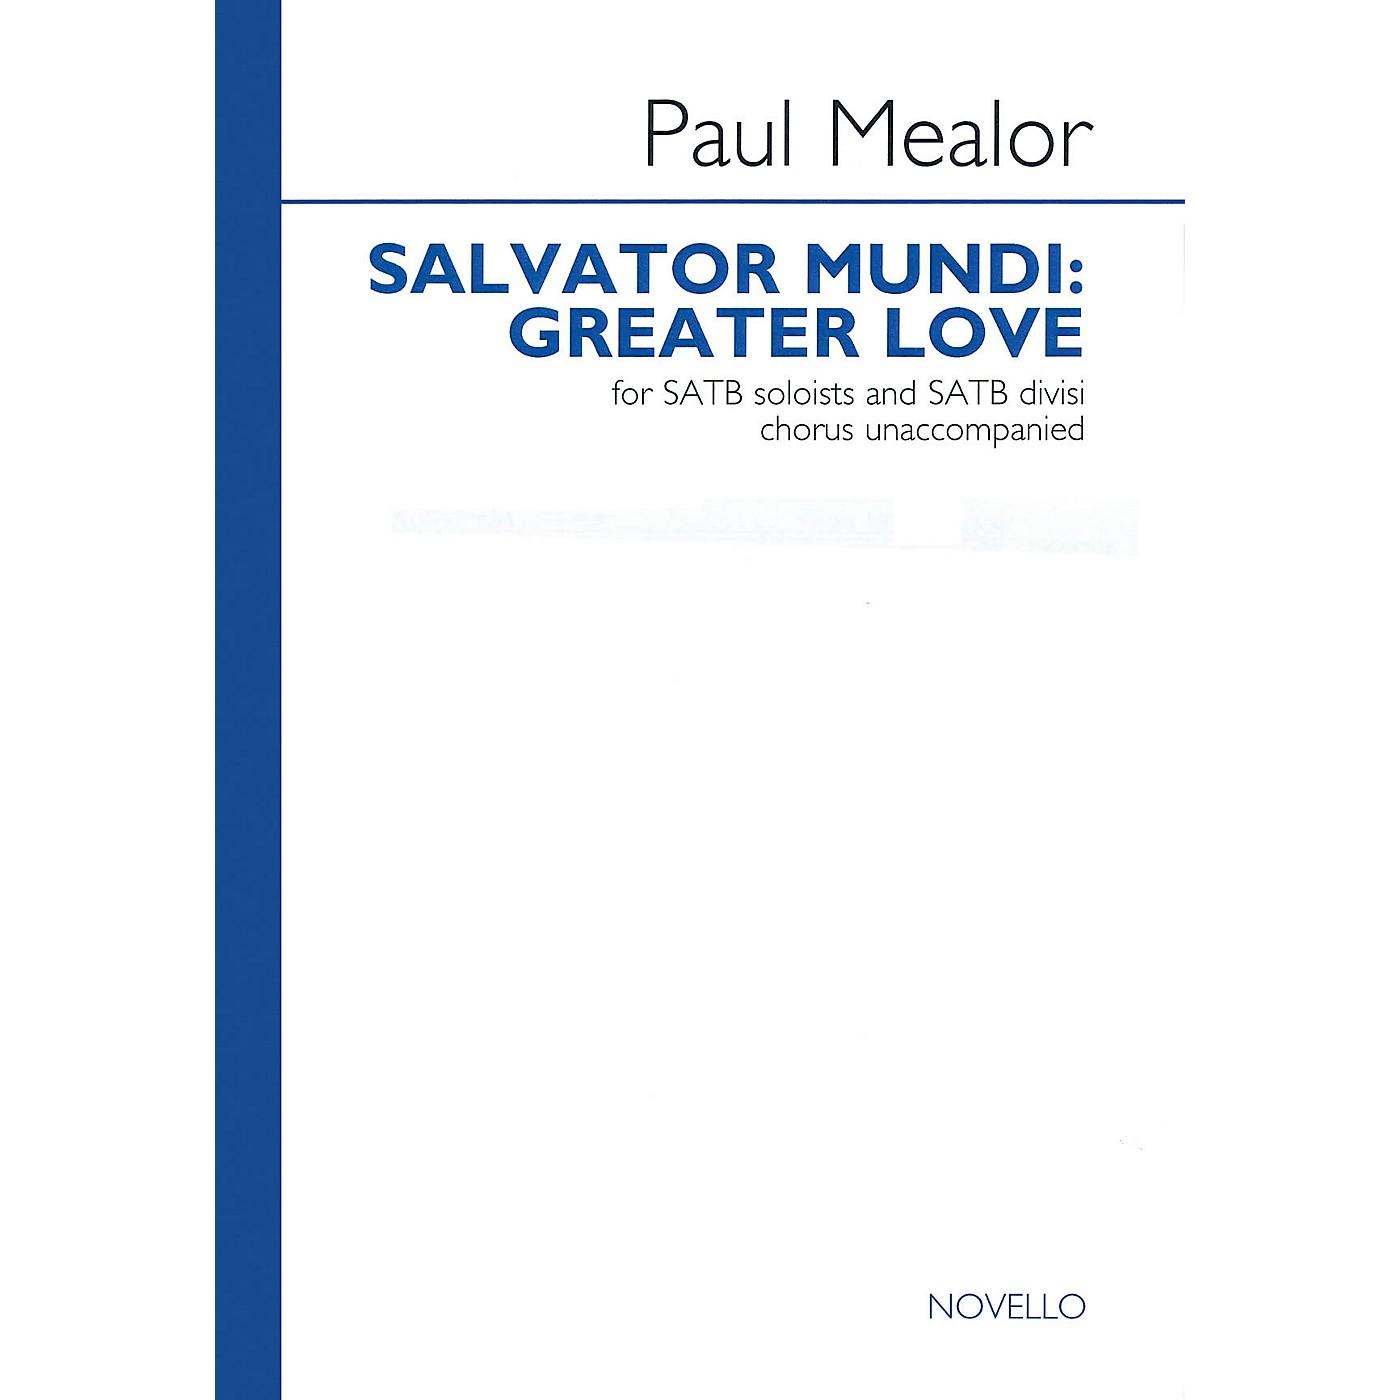 Novello Salvator Mundi: Greater Love SATB DV A Cappella Composed by Paul Mealor thumbnail